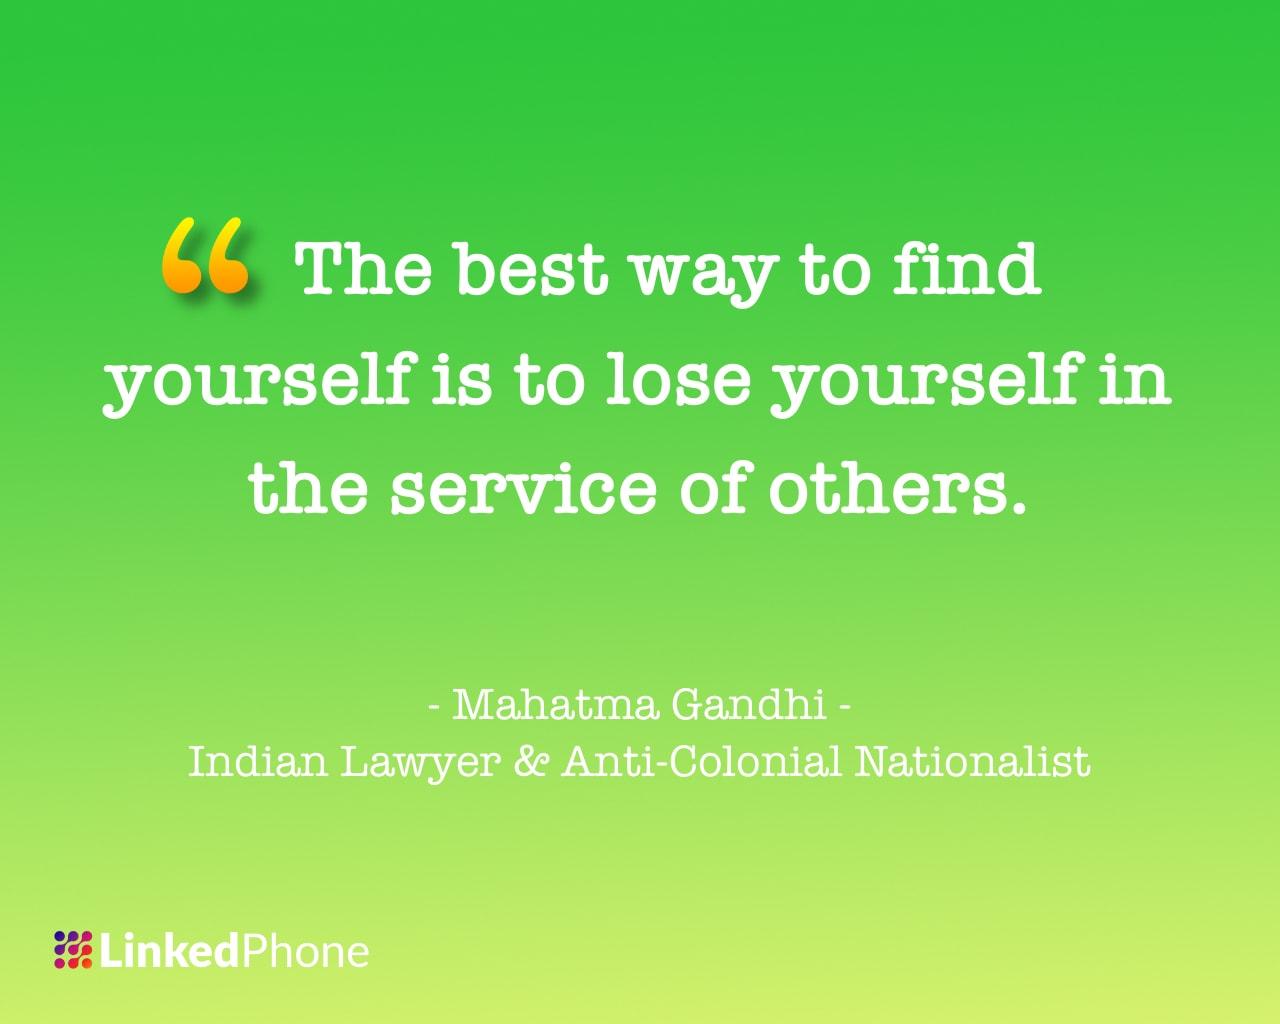 Mahatma Gandhi - Motivational Inspirational Quotes and Sayings